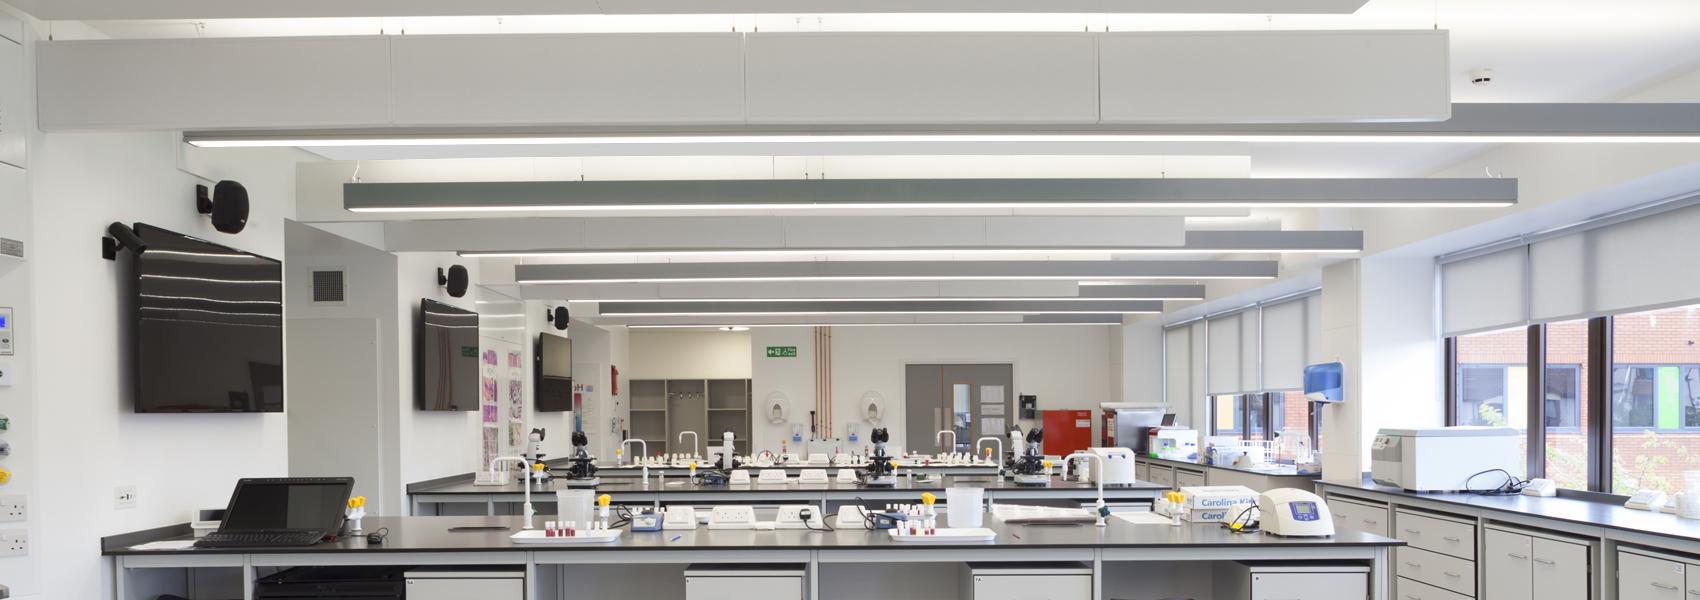 Fleming Building University Of Sunderland Hacel Lighting